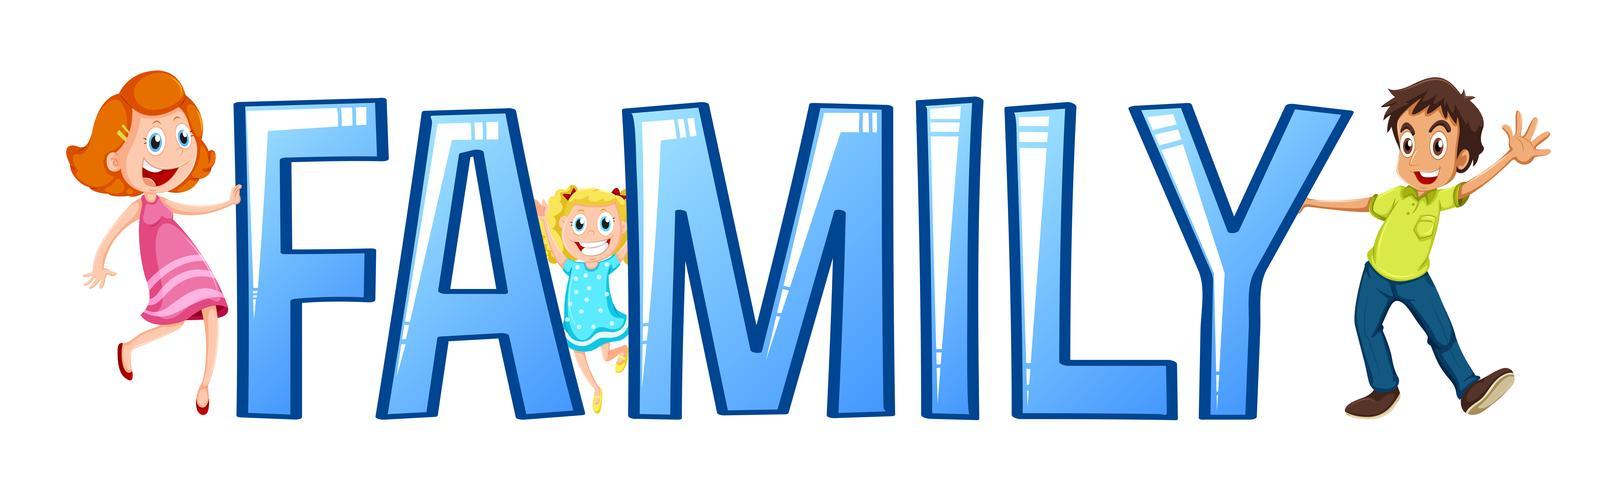 Font design for word family.